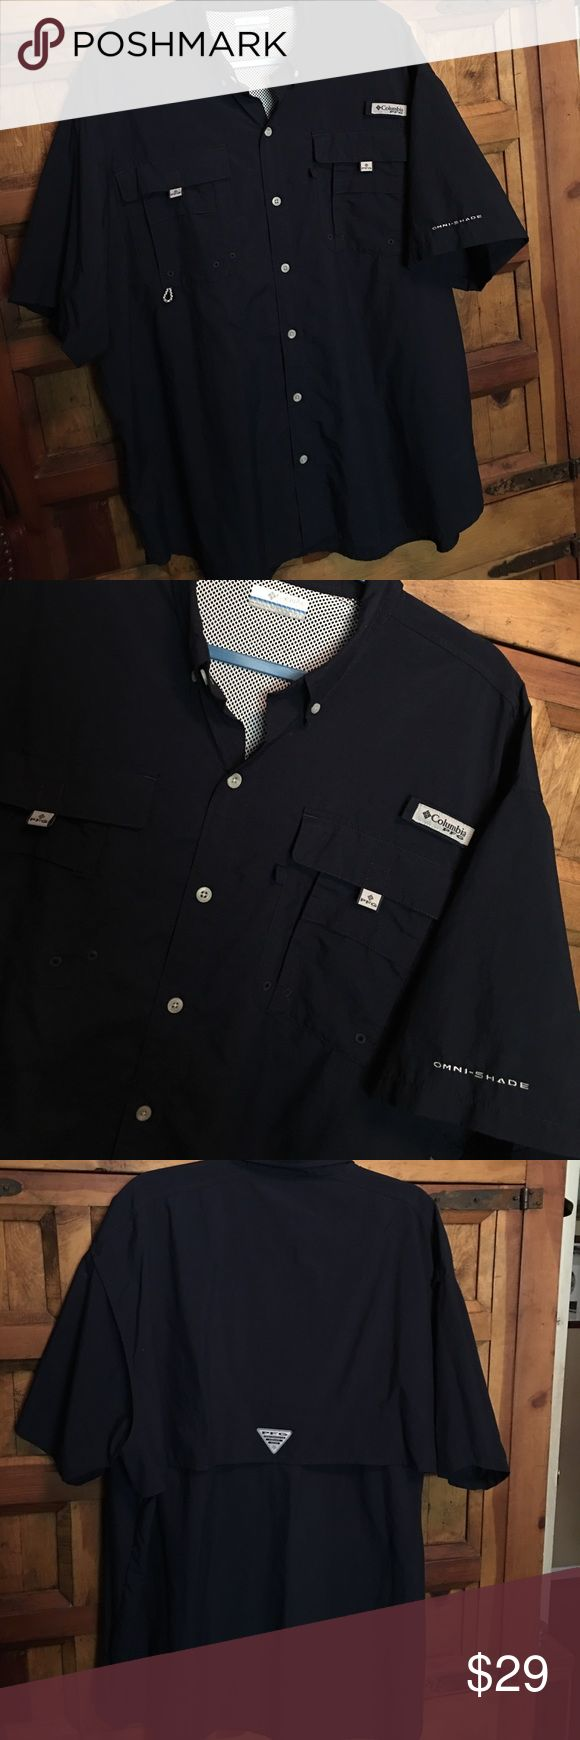 COLUMBIA PFG MENS BUTTON UP SHIRT  🐠☀️ Never worn men's COLUMBIA PFG shirt size XL/TG the color is Navy Blue💪🏽😎 Columbia Shirts Casual Button Down Shirts